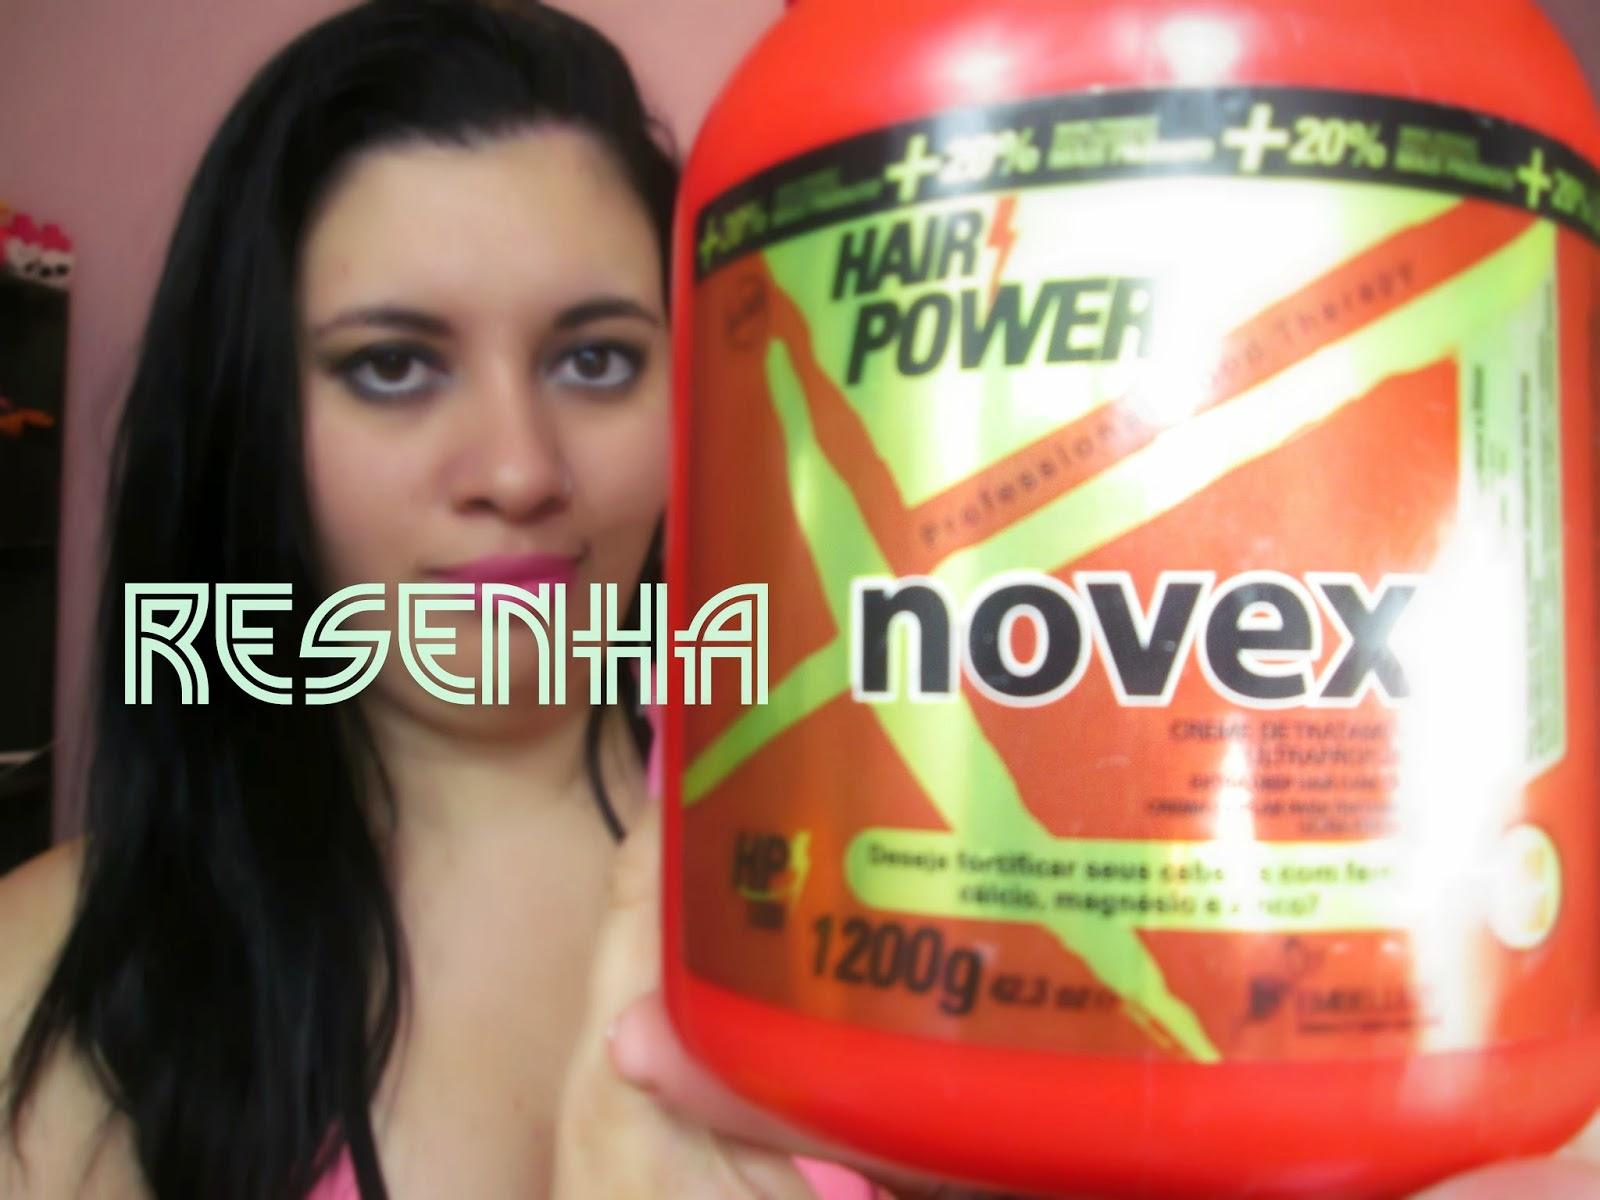 novex,hair power,hodratação